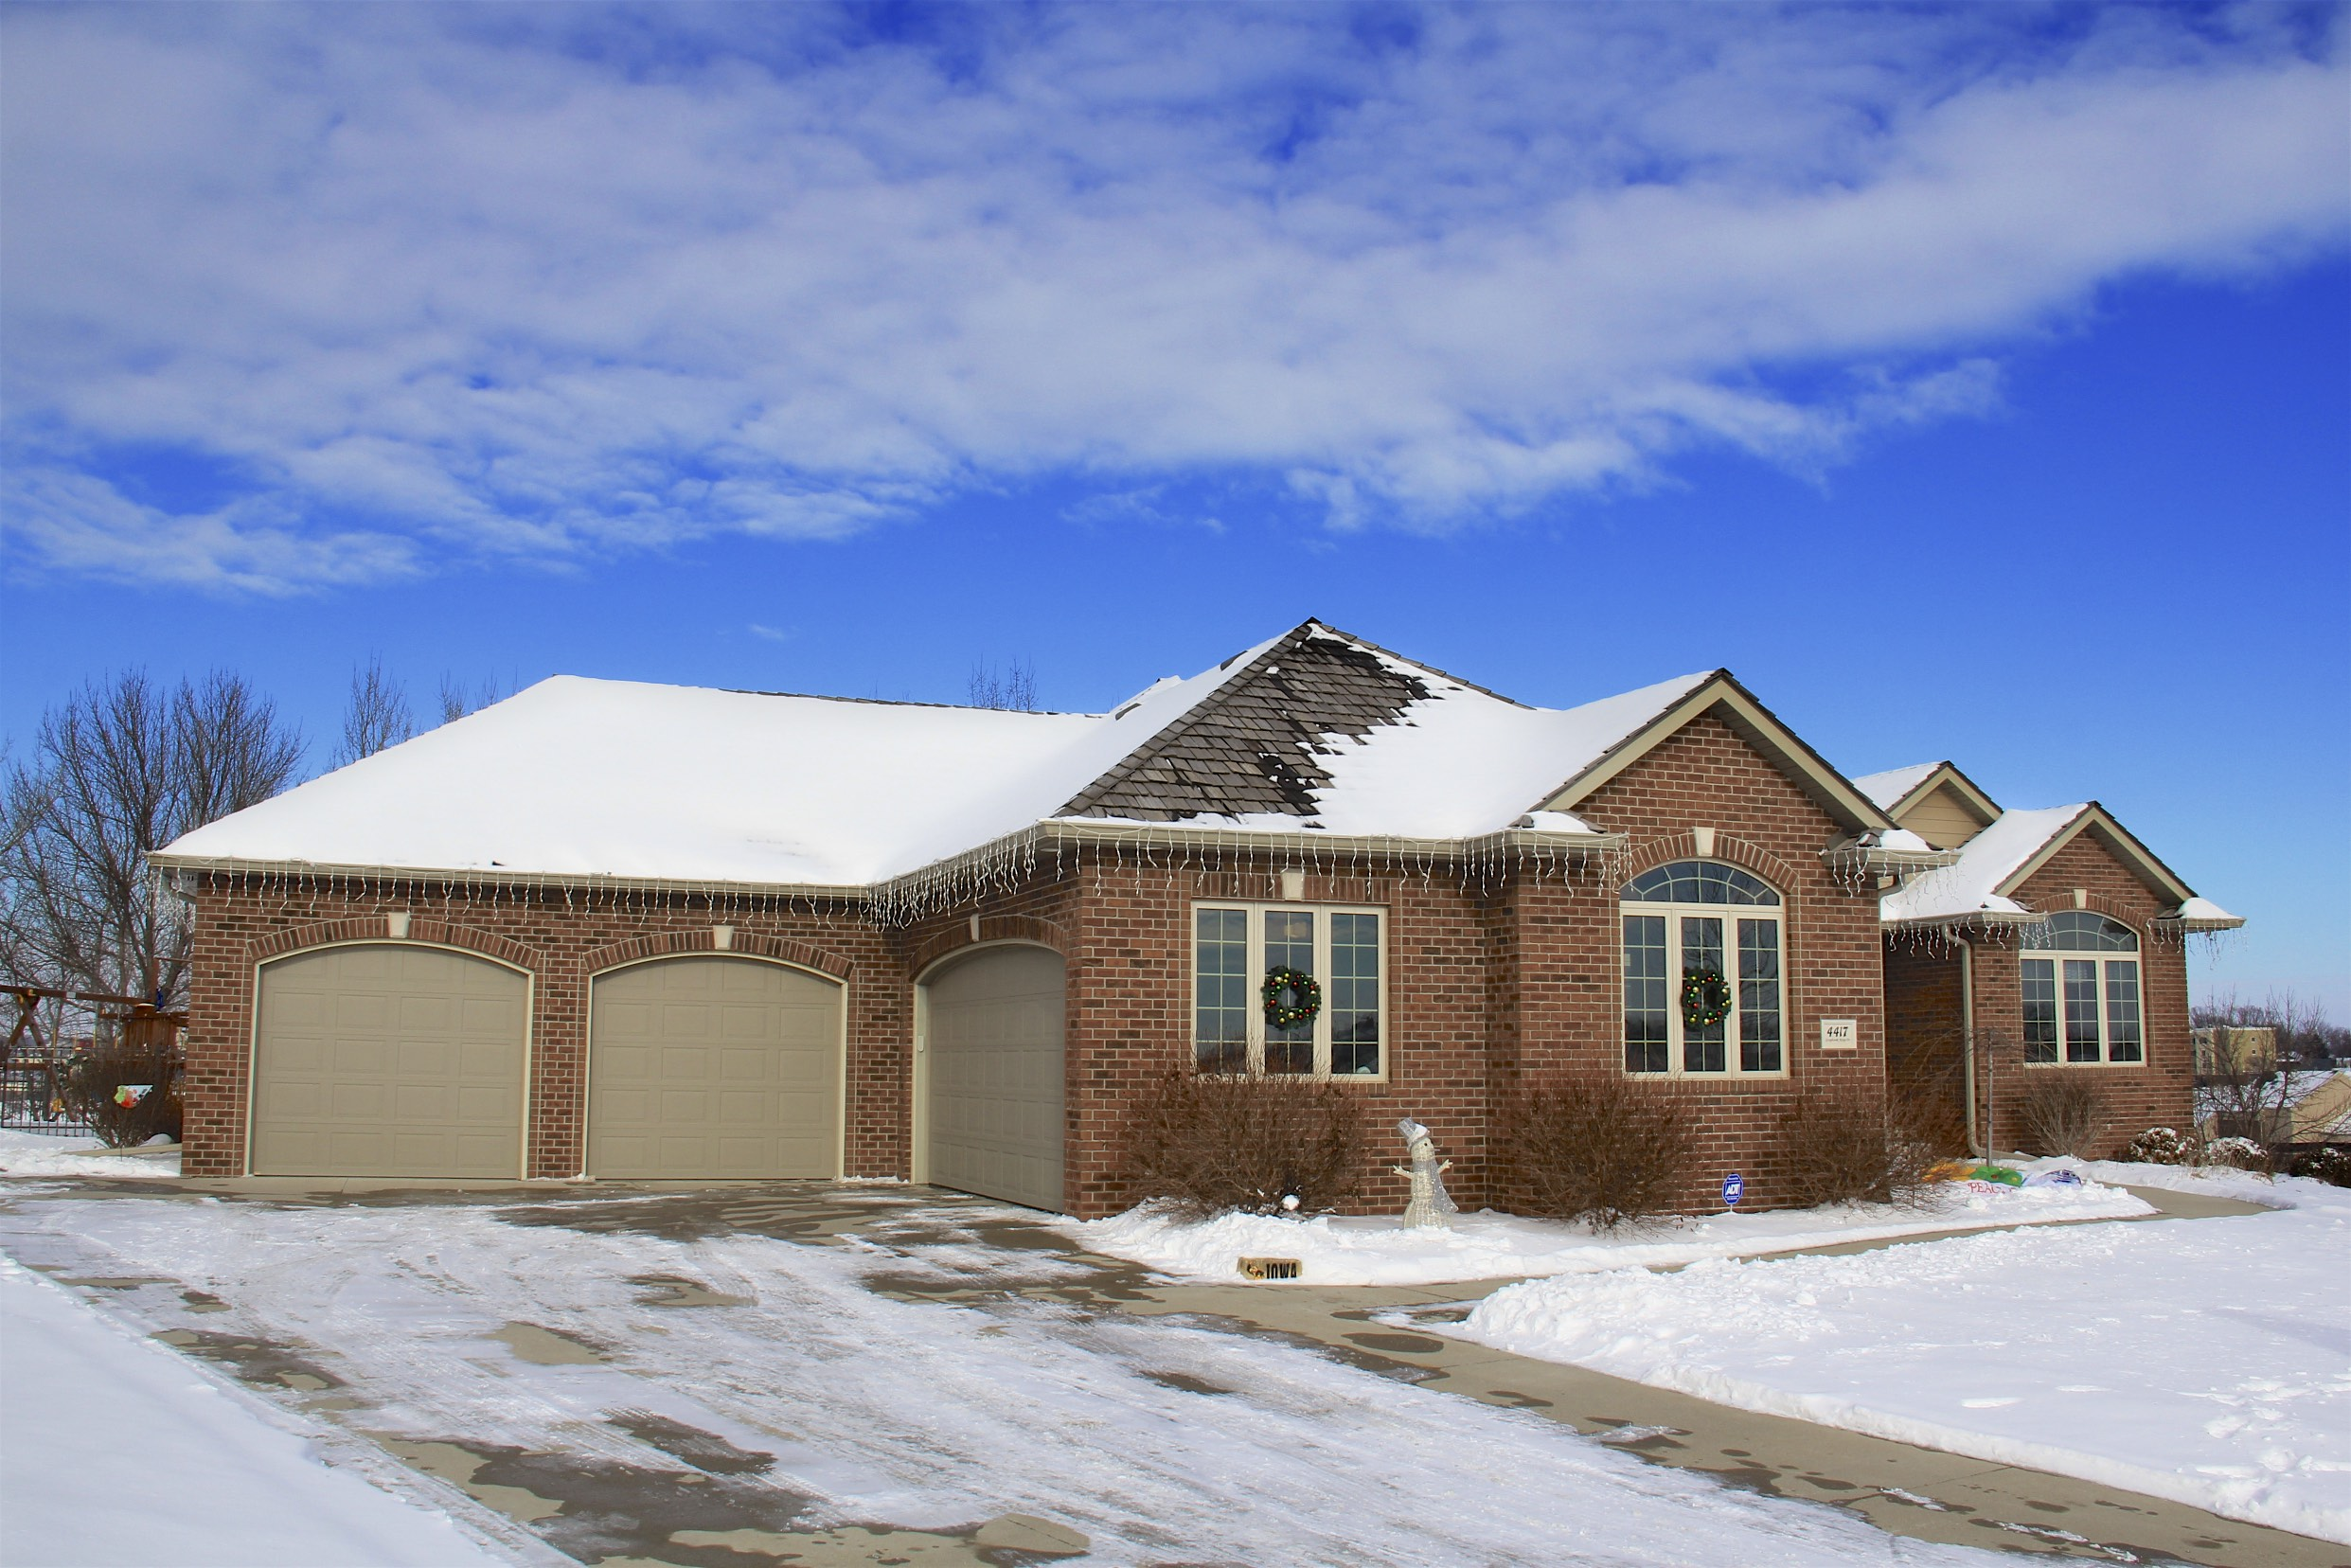 4417 Grayhawk Ridge, Sioux City, IA 51106